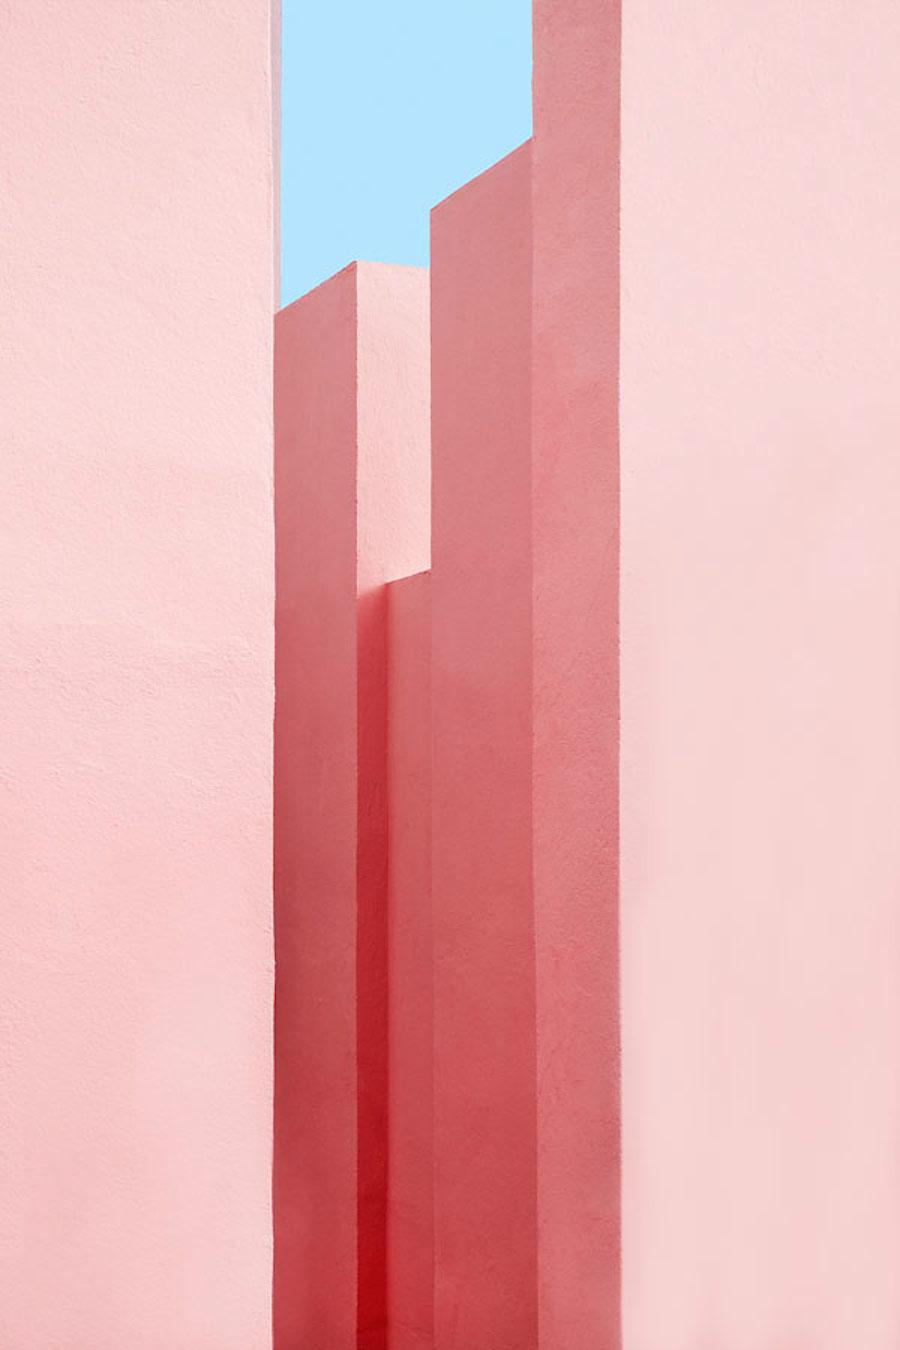 architecturespain-5.jpg